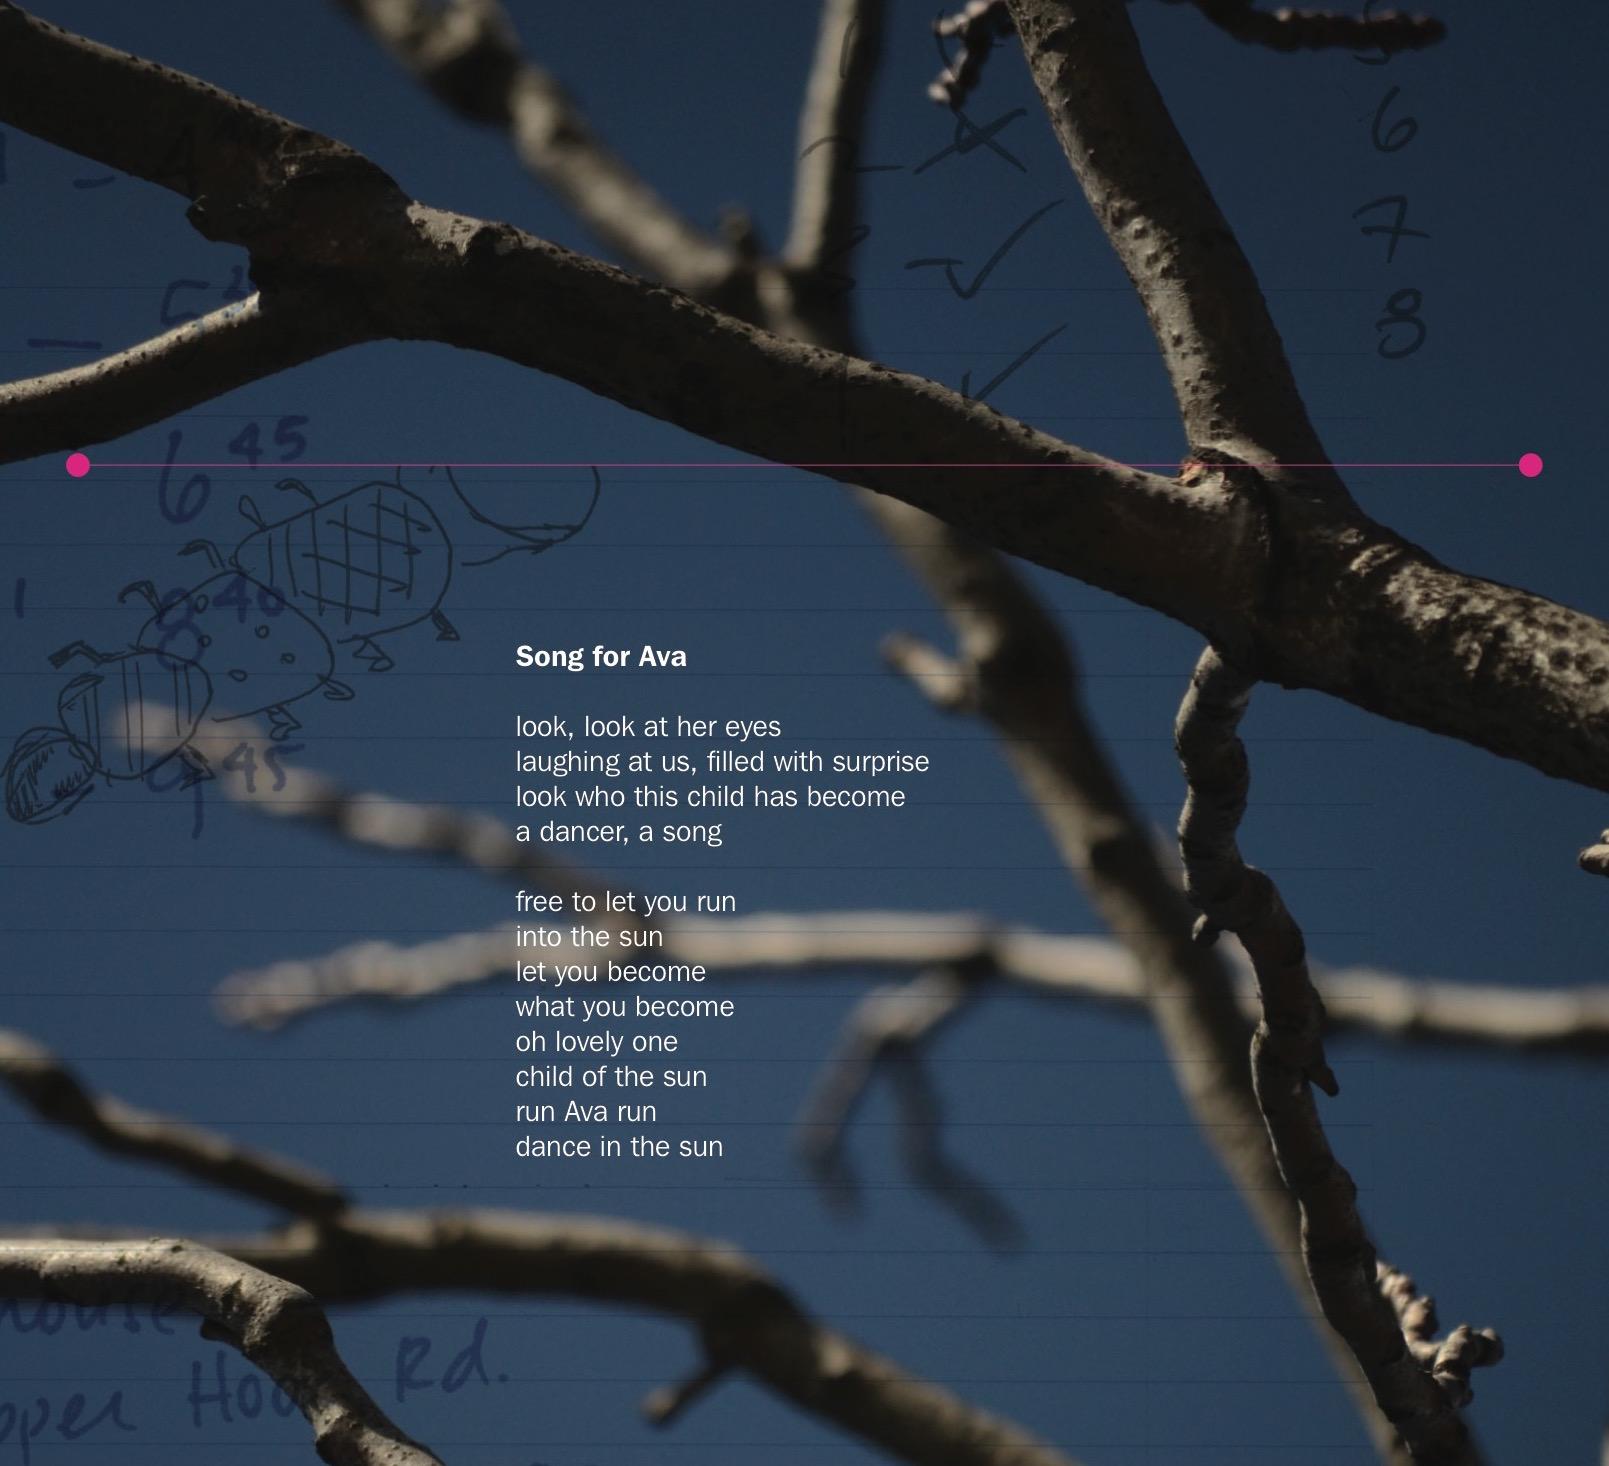 Song of Ava_album_sleeve 2.jpeg